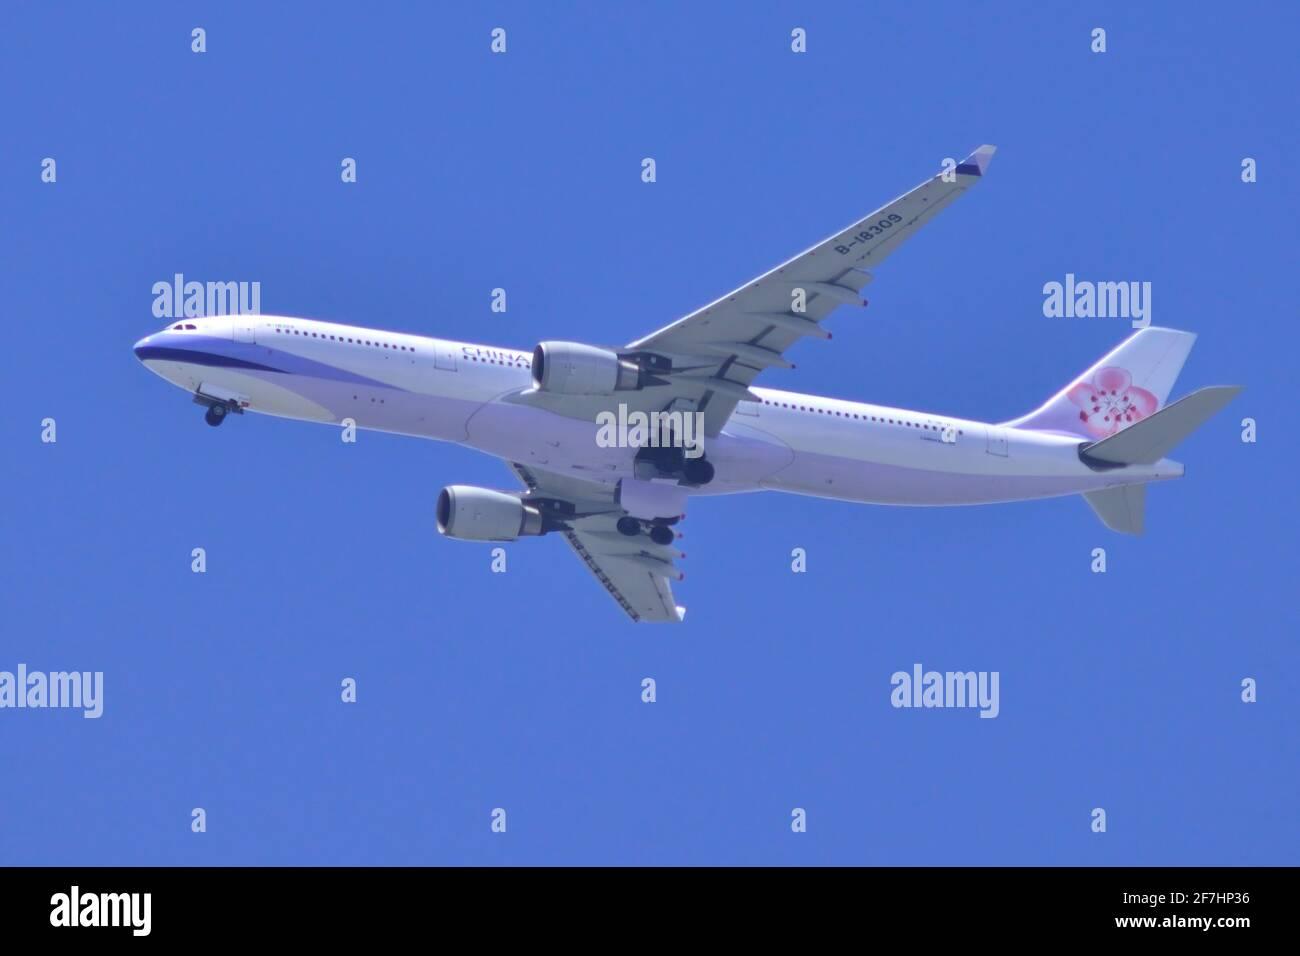 China Airlines, Taiwan, Airbus, A330-300, B-18309, Final approach, Landing, Tokyo Haneda Airport, Tokyo, Japan Stock Photo